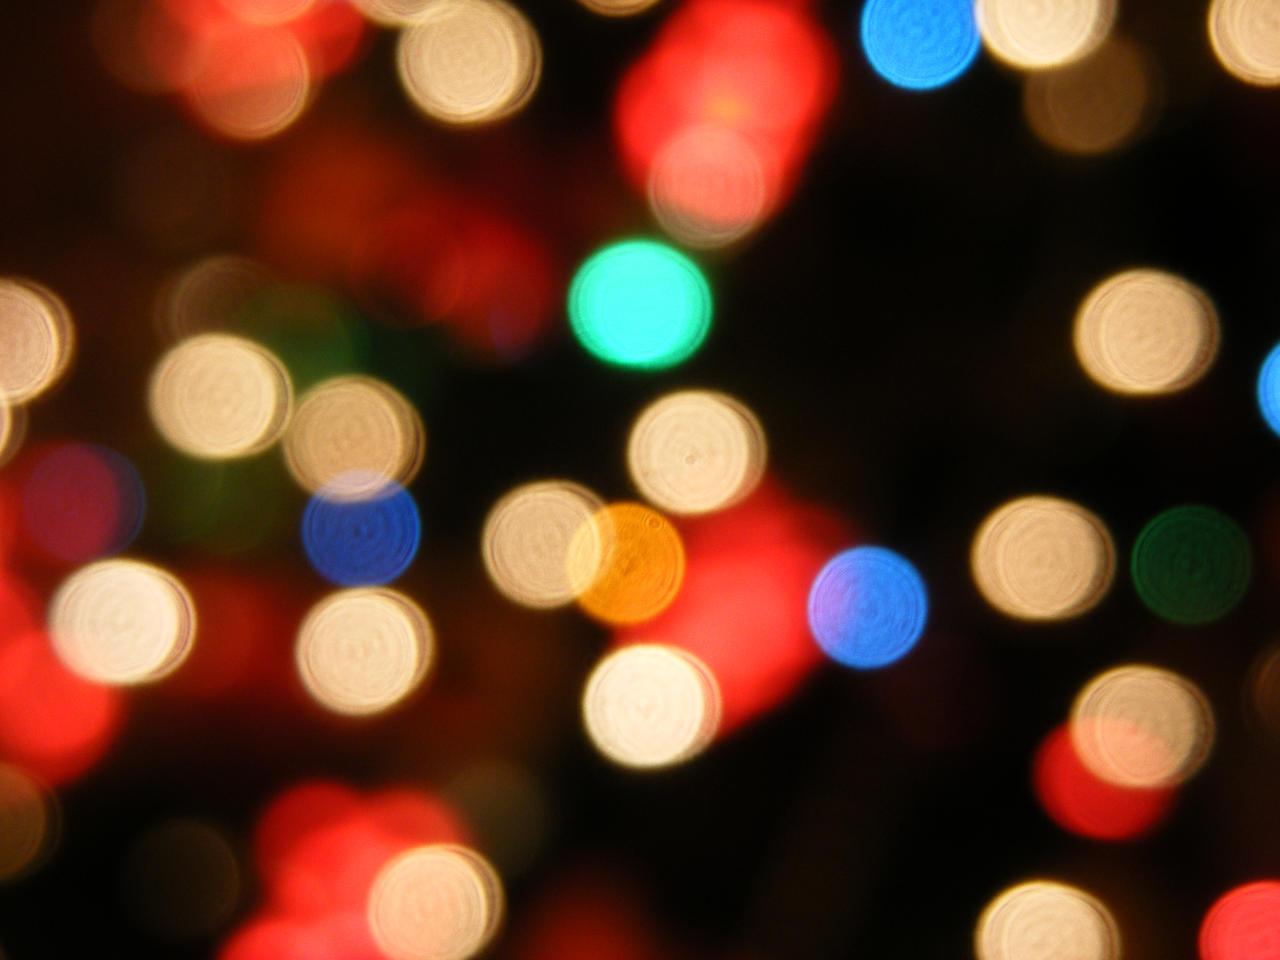 Blurry Lights By Rafk